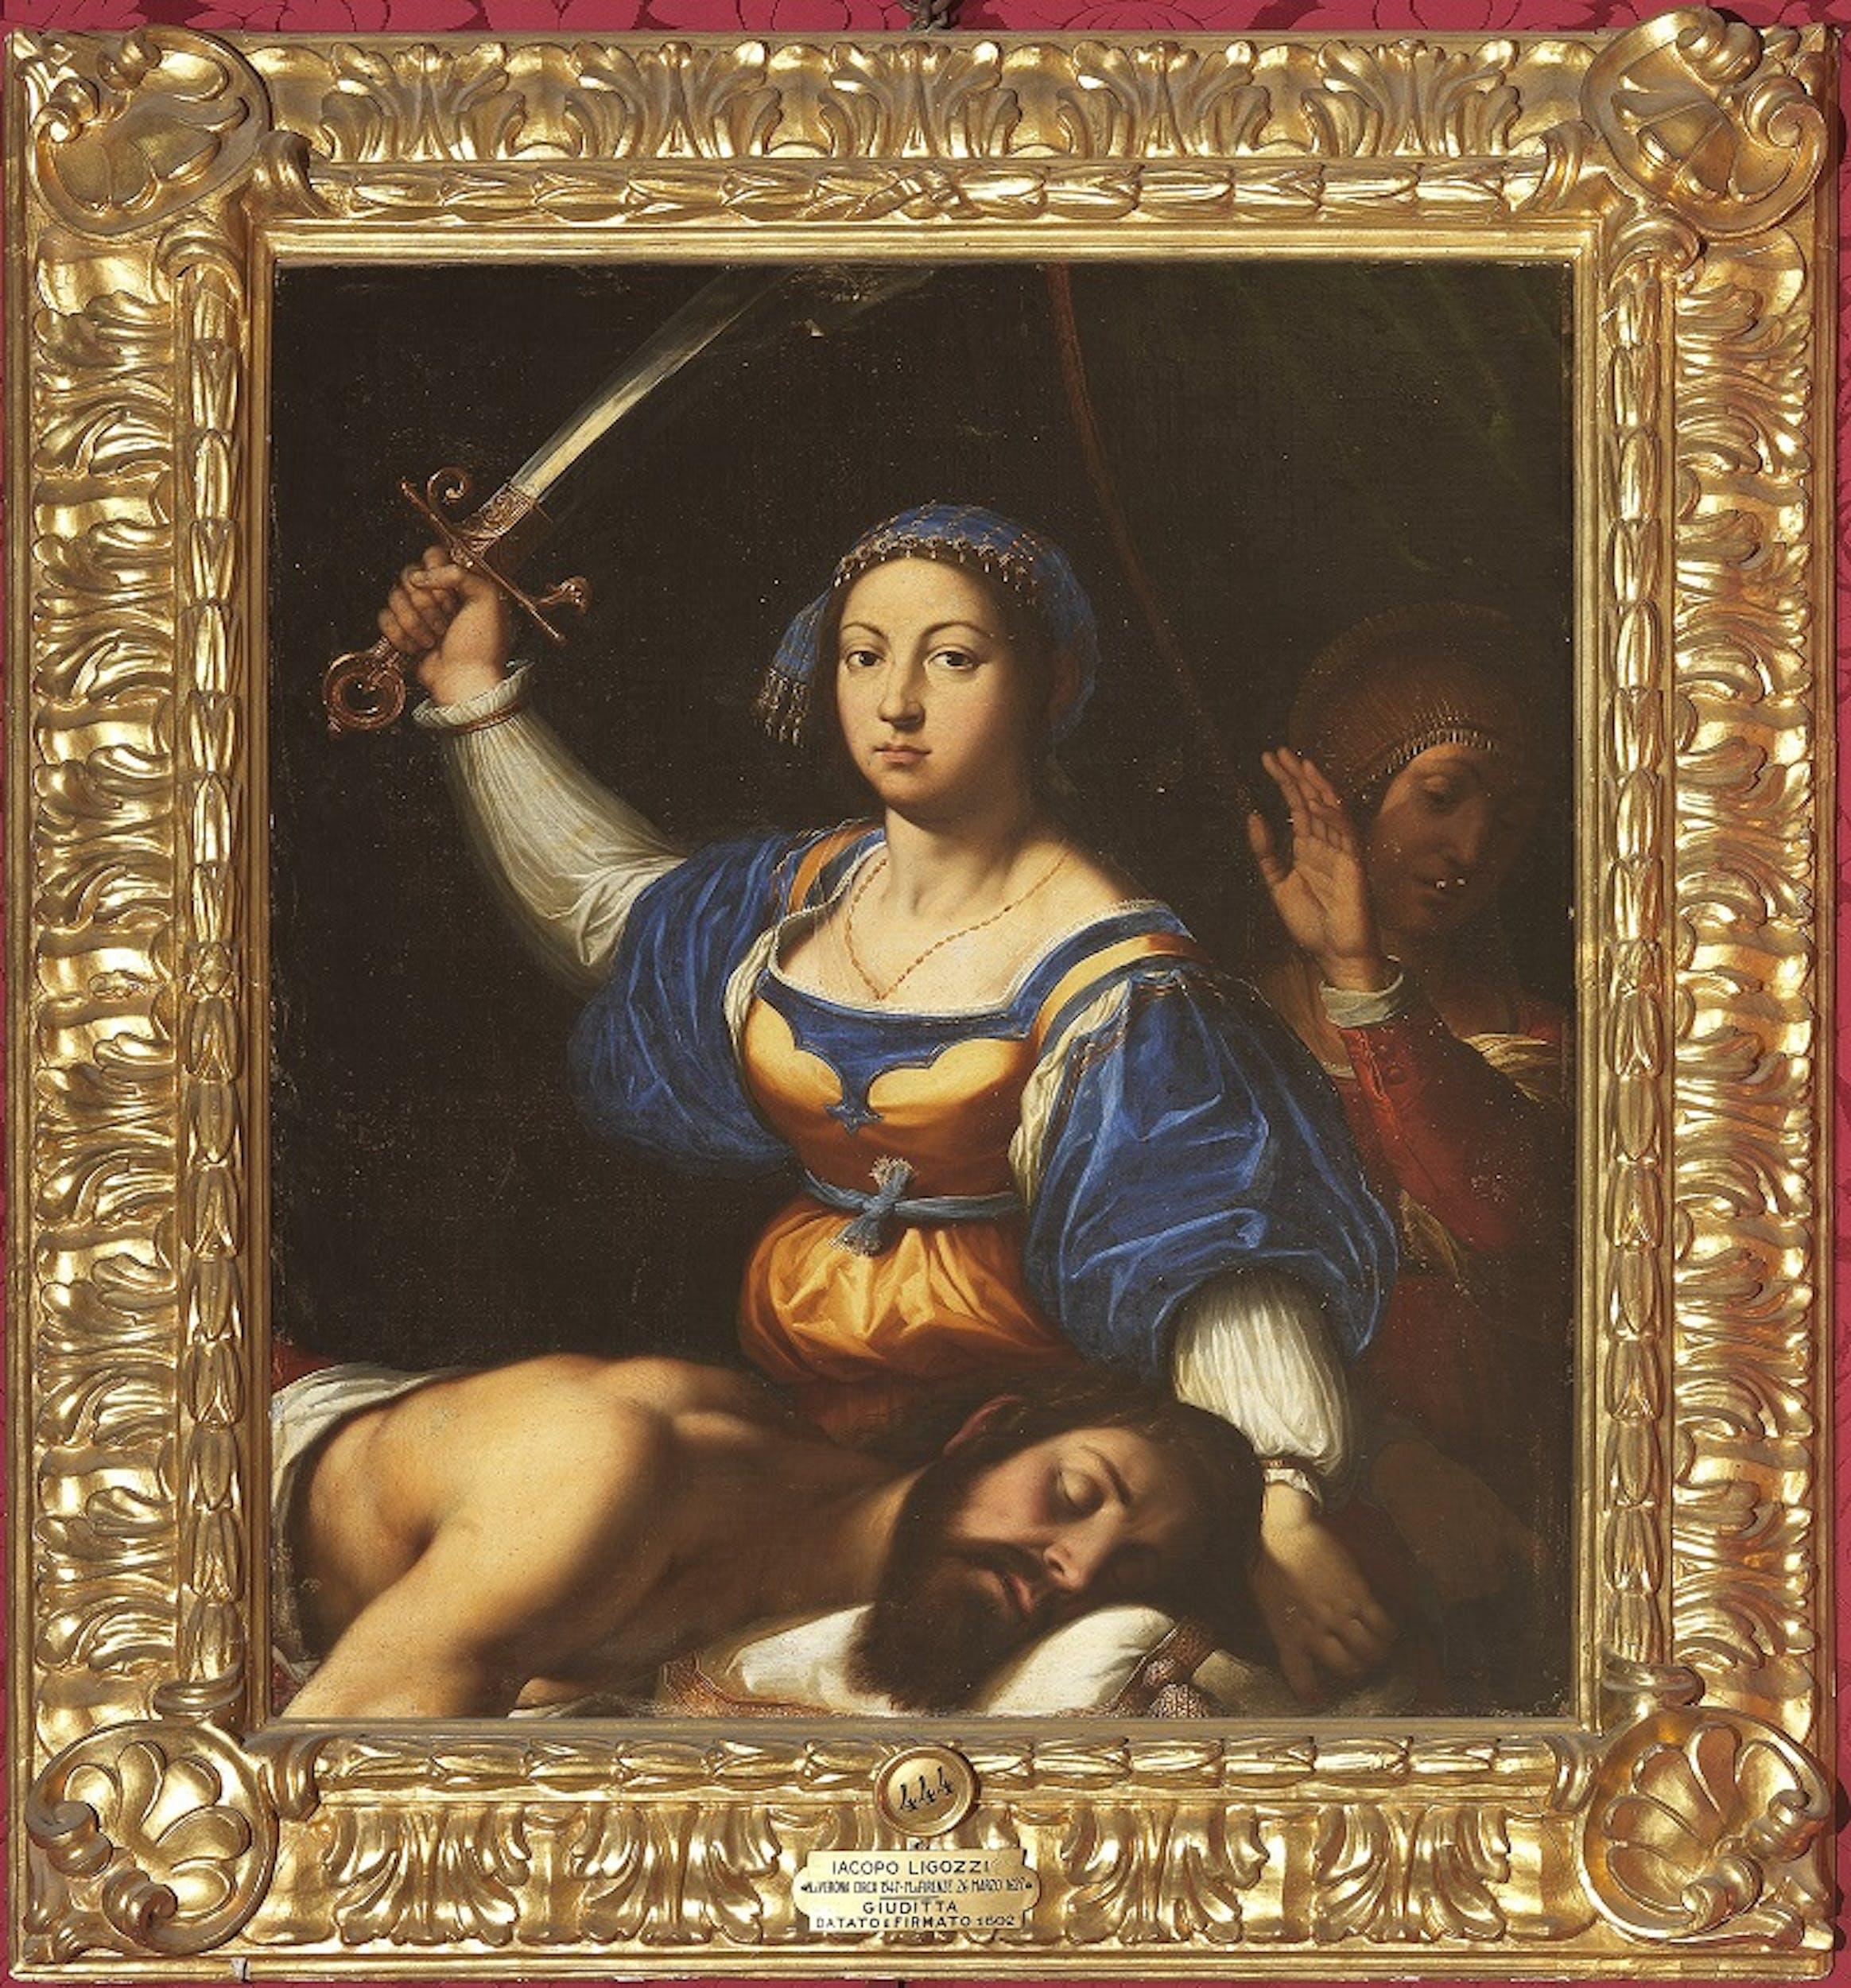 Jacopo Ligozzi, Giuditta e Oloferne